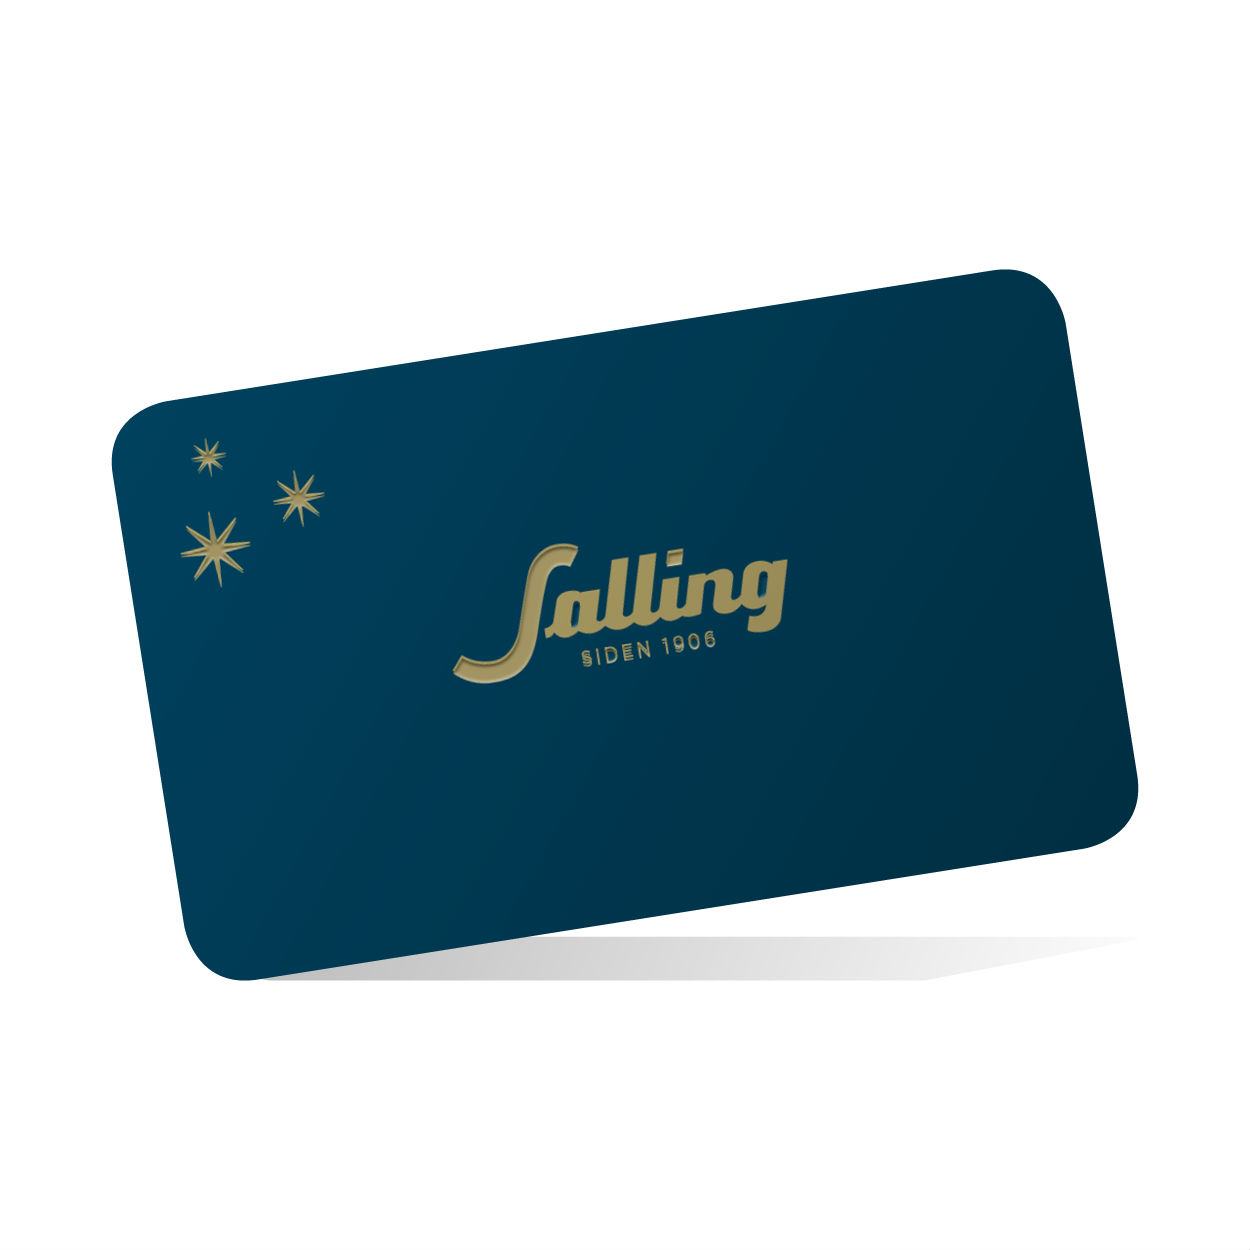 Salling gavekort - 1600 kr